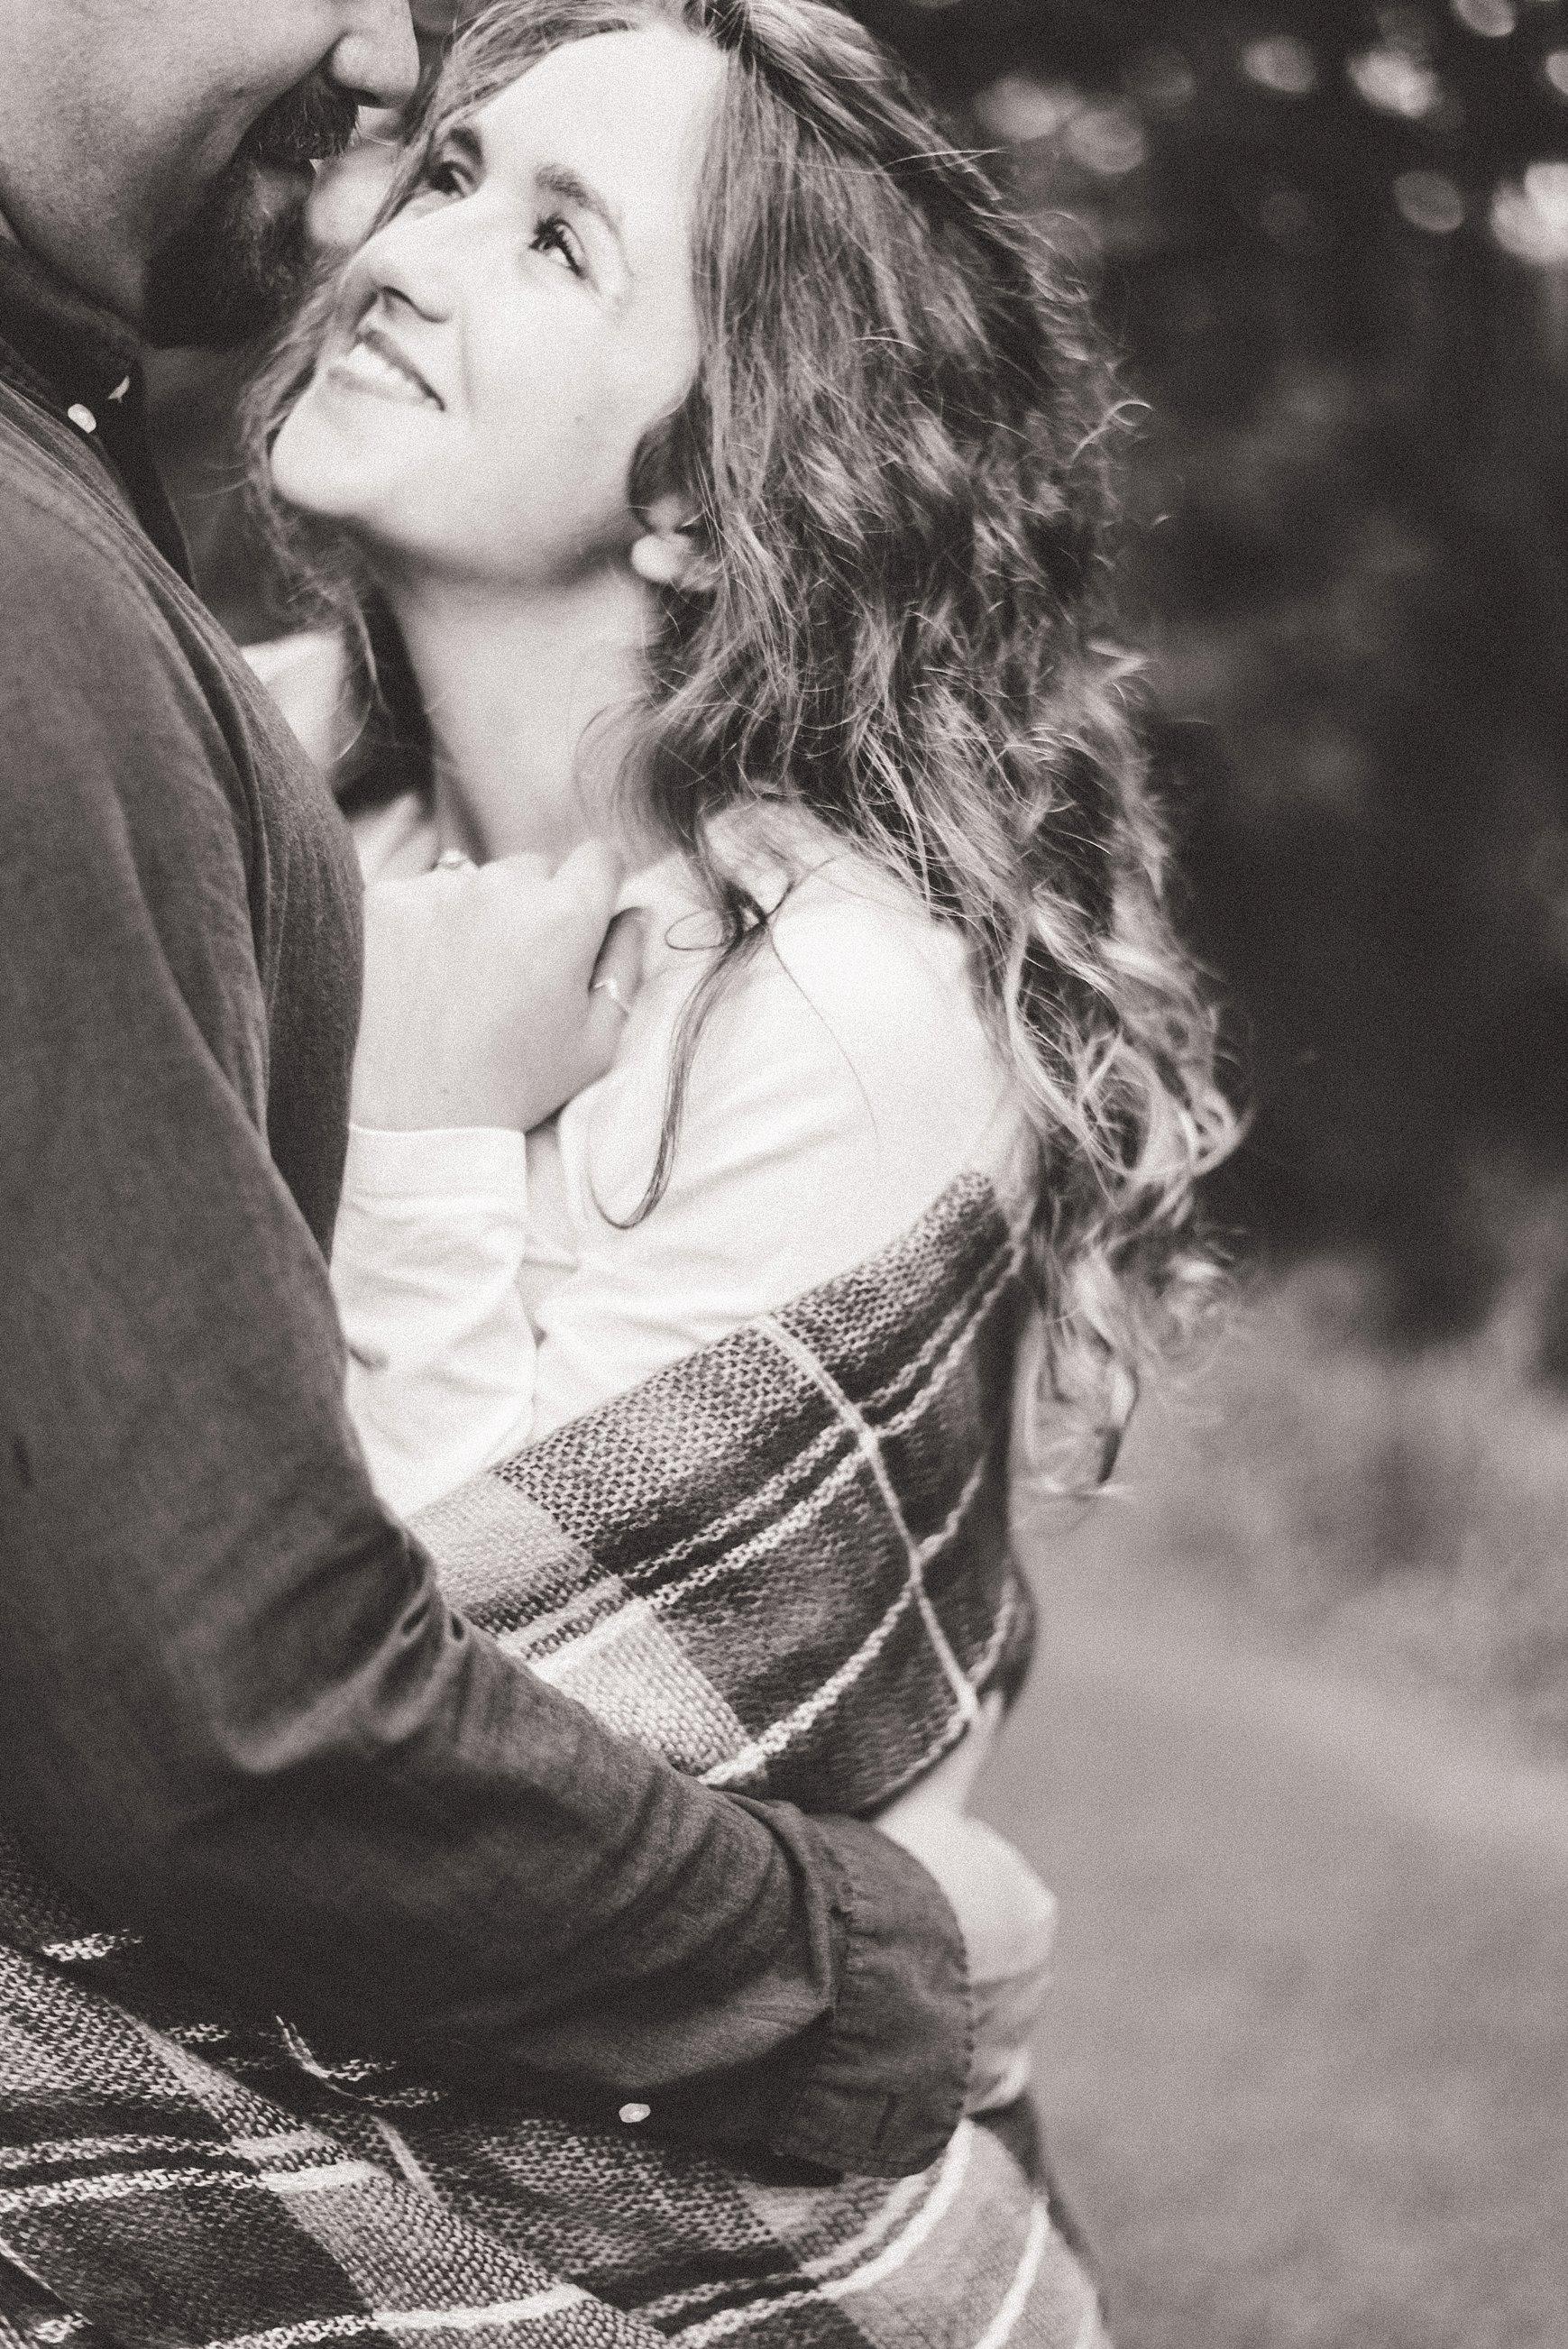 light, airy, fine art, documentary ottawa wedding photographer - best engagement photos 2017_0012.jpg